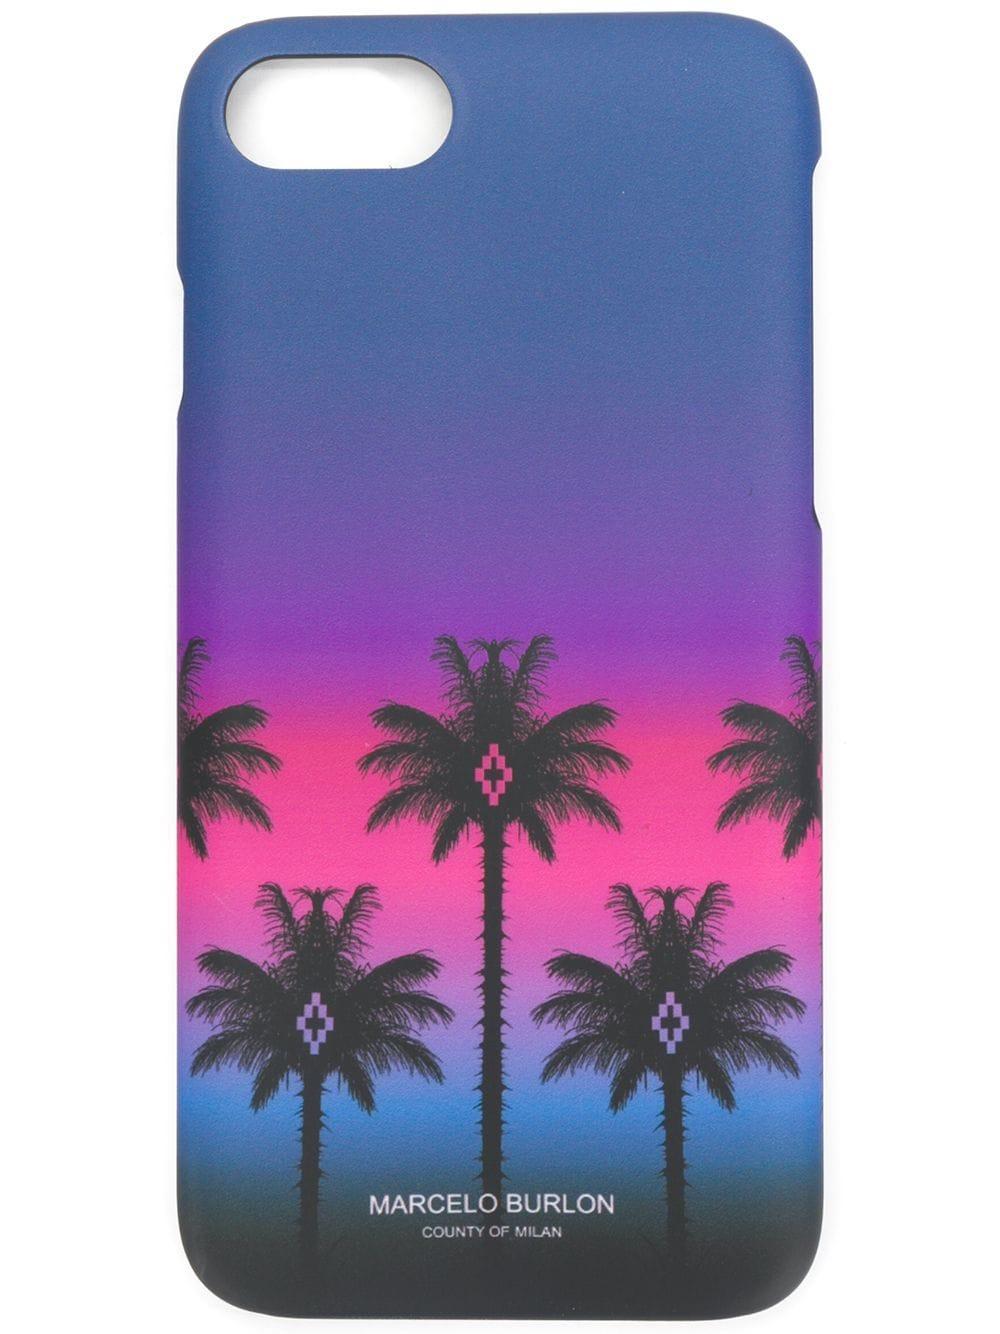 Marcelo Burlon County Of Milan Palms Iphone 7 Case - Multicolour